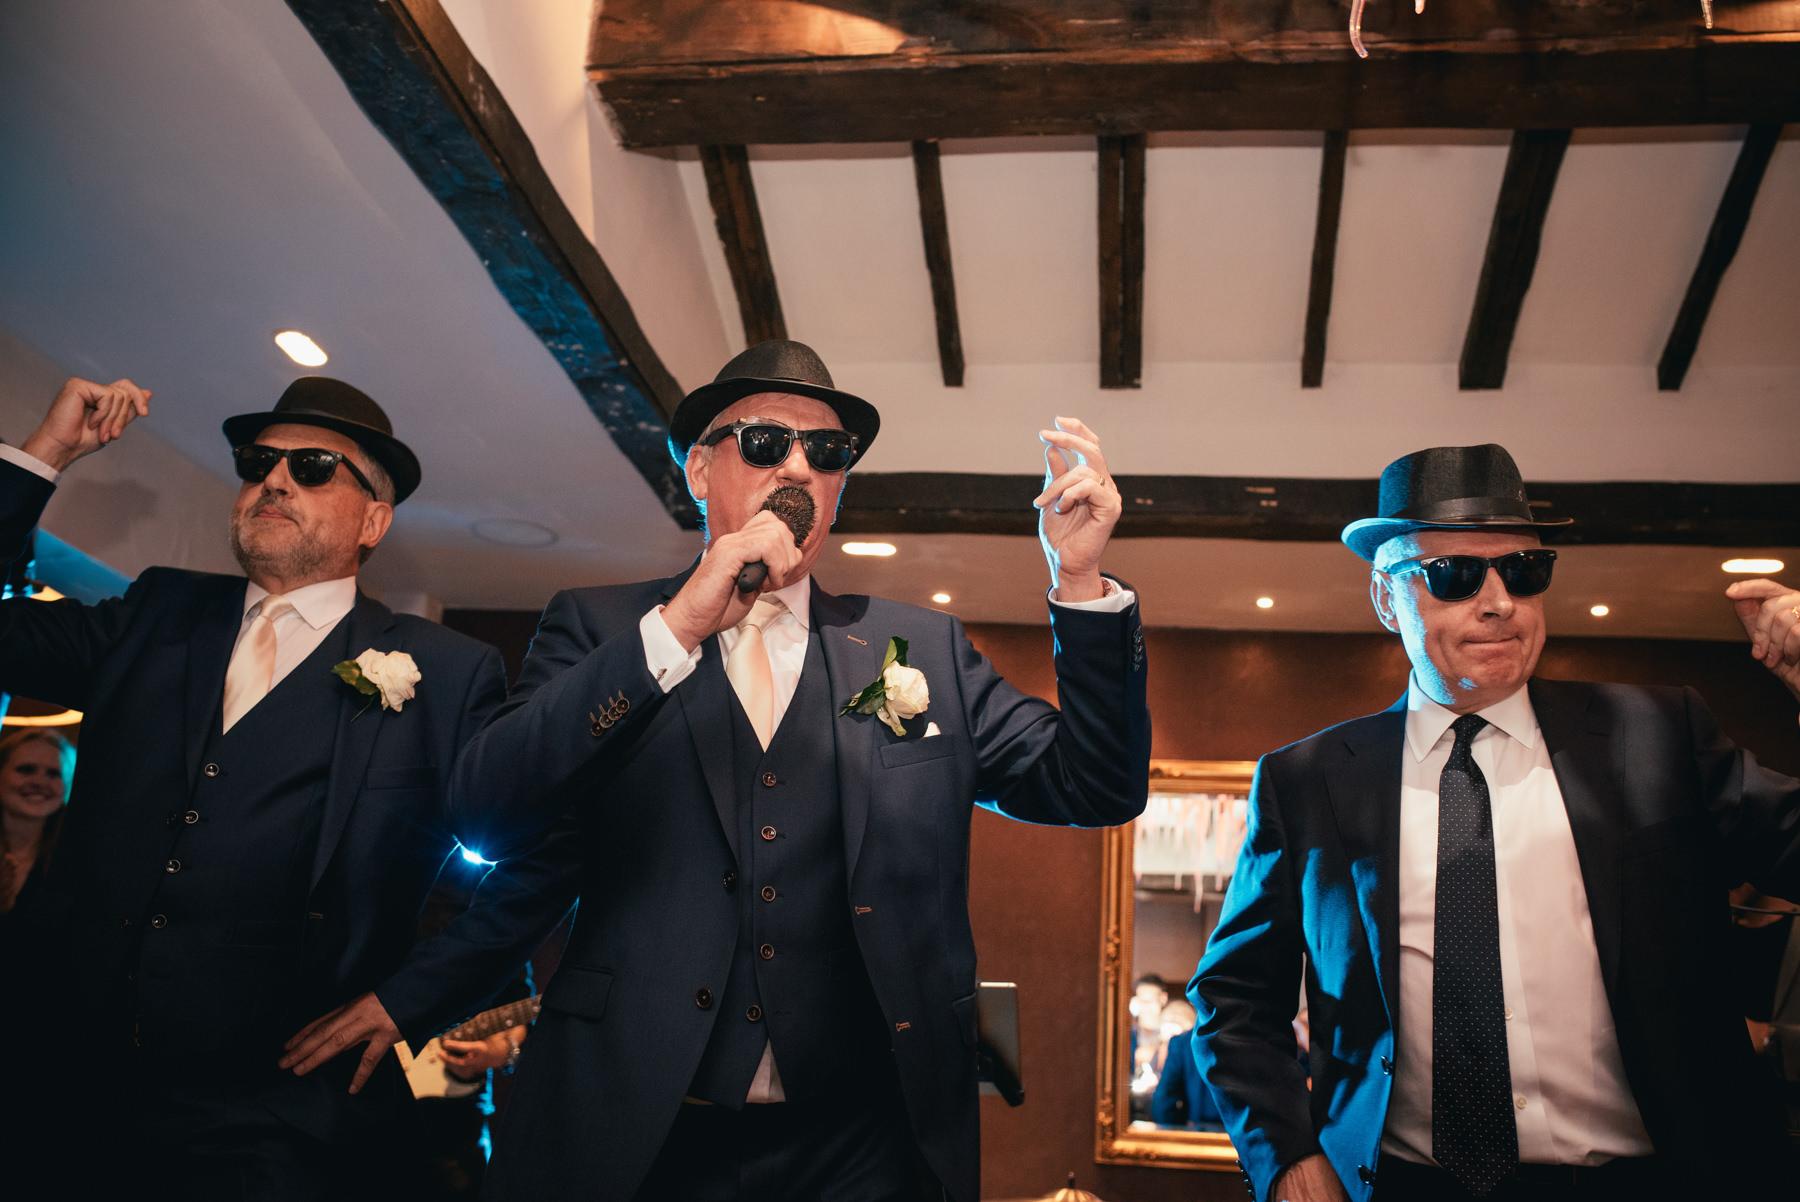 liverpool-wedding-photographer-67